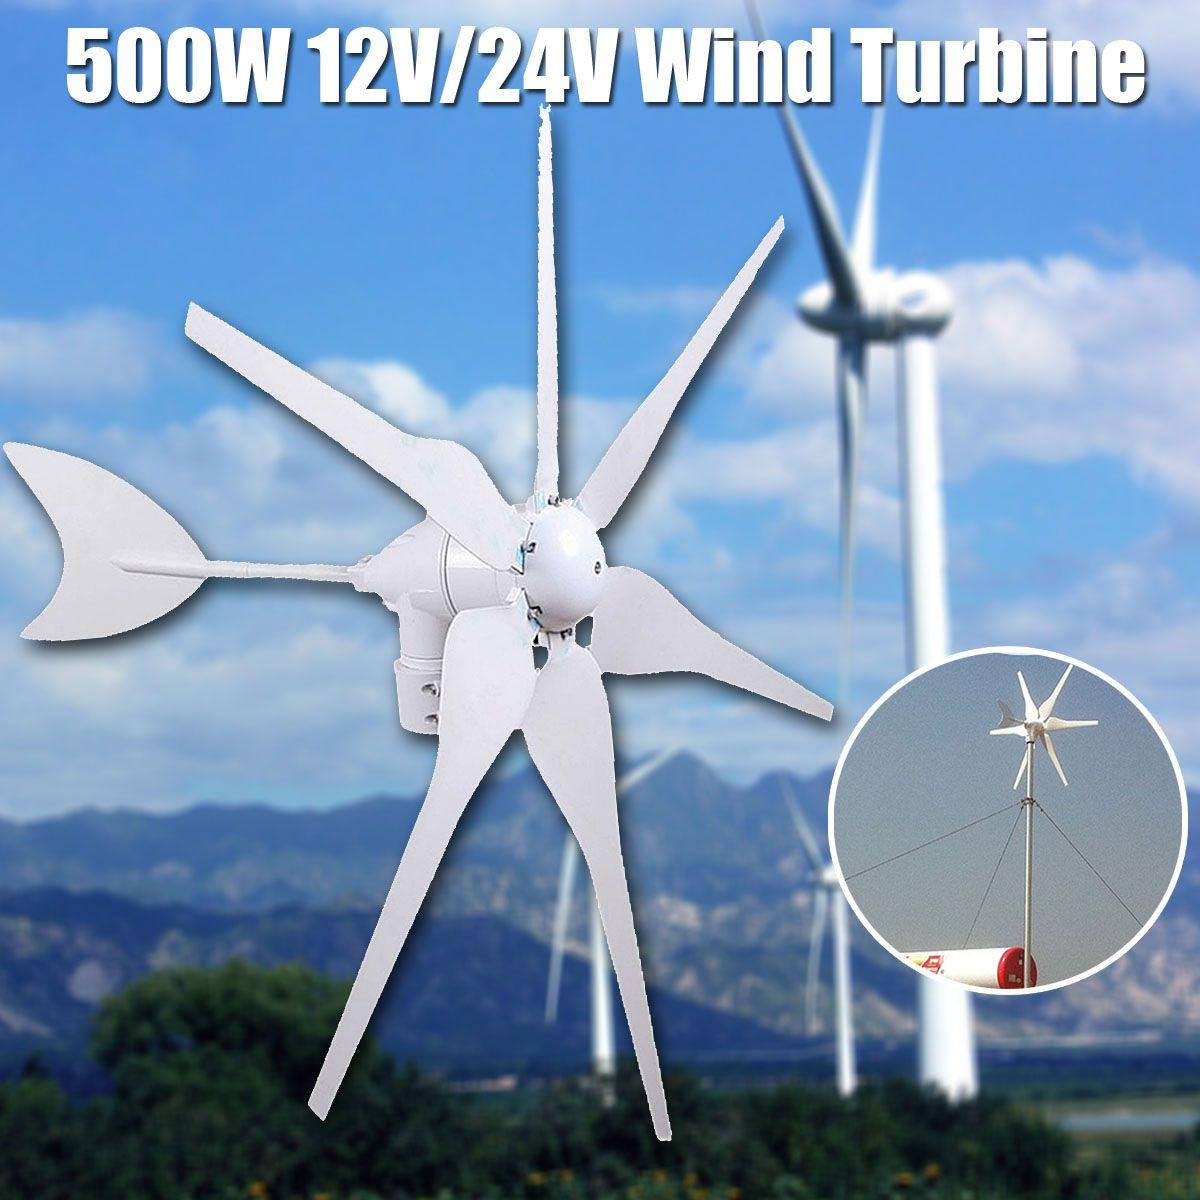 500 watt 12 v/24 v Energie Umwelt 6 Klingen Mini Wind Turbinen Generator Miniatur Windkraftanlagen Wohn Hause mit Controller